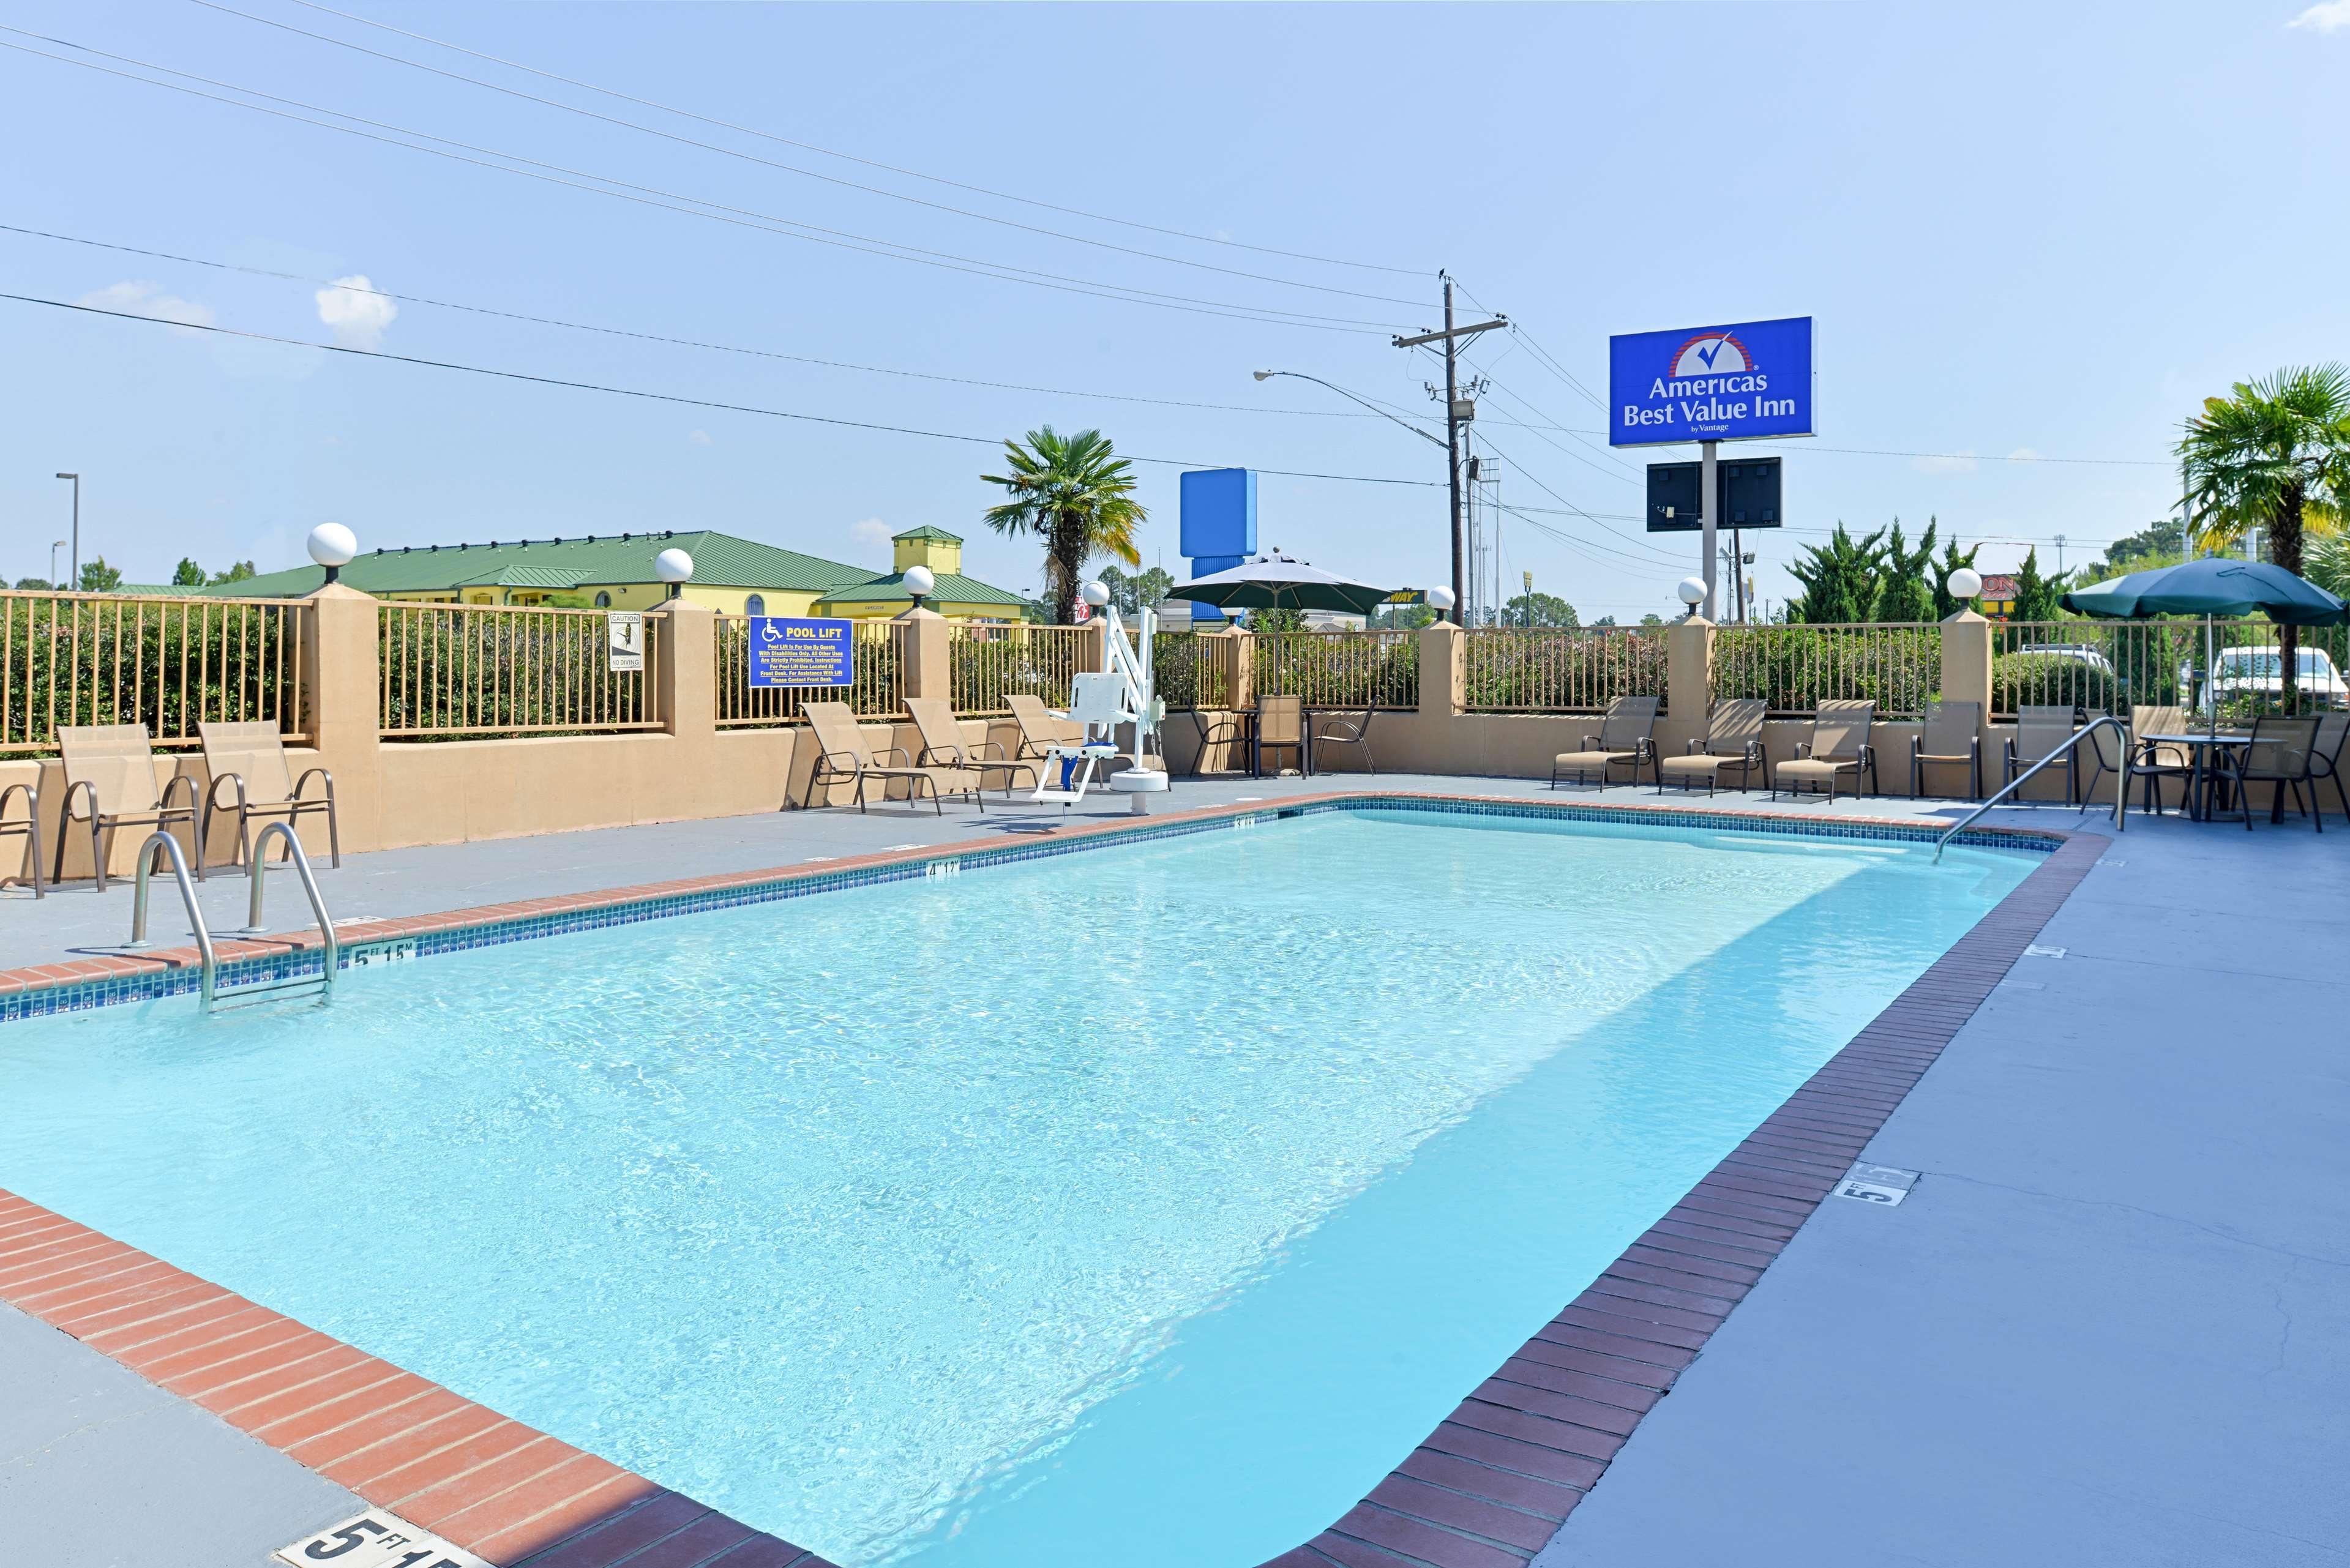 Americas Best Value Inn Denham Springs Baton Rouge Denham Springs Louisiana La